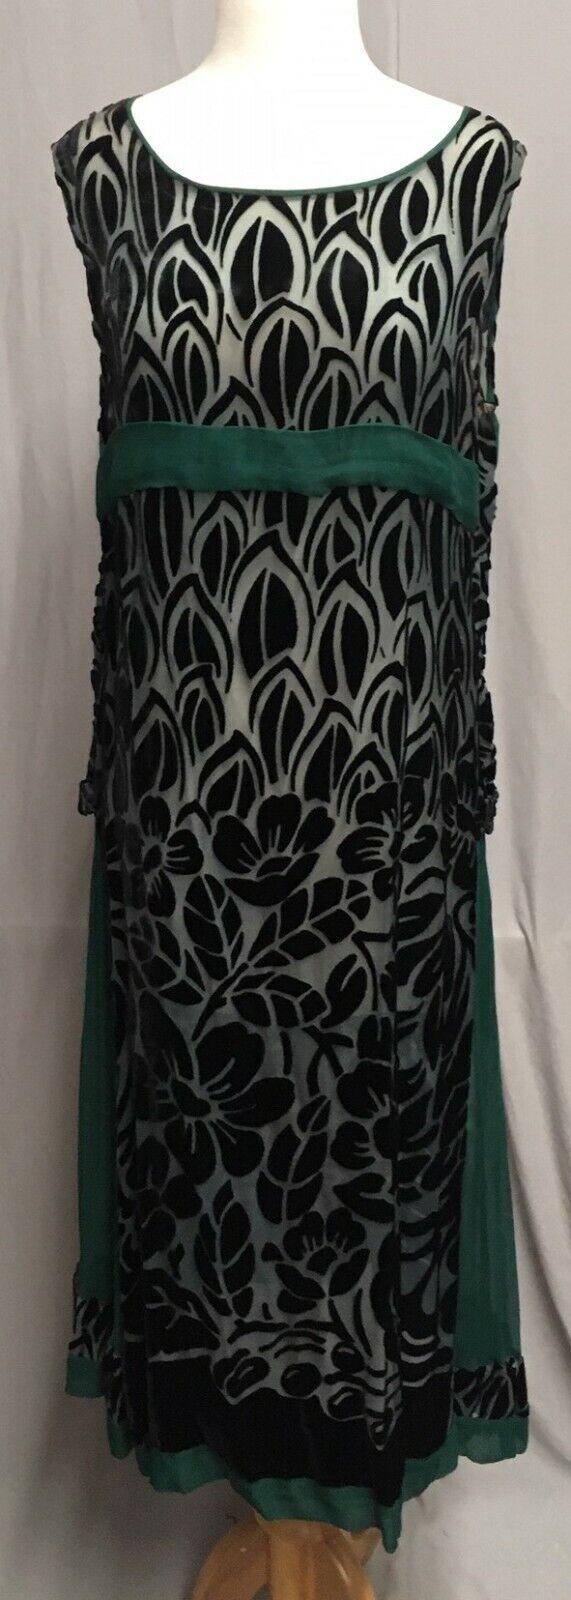 #20-217, 1920's Black & Blue Cut Velvet with Forest Green Silk Chiffon Dress